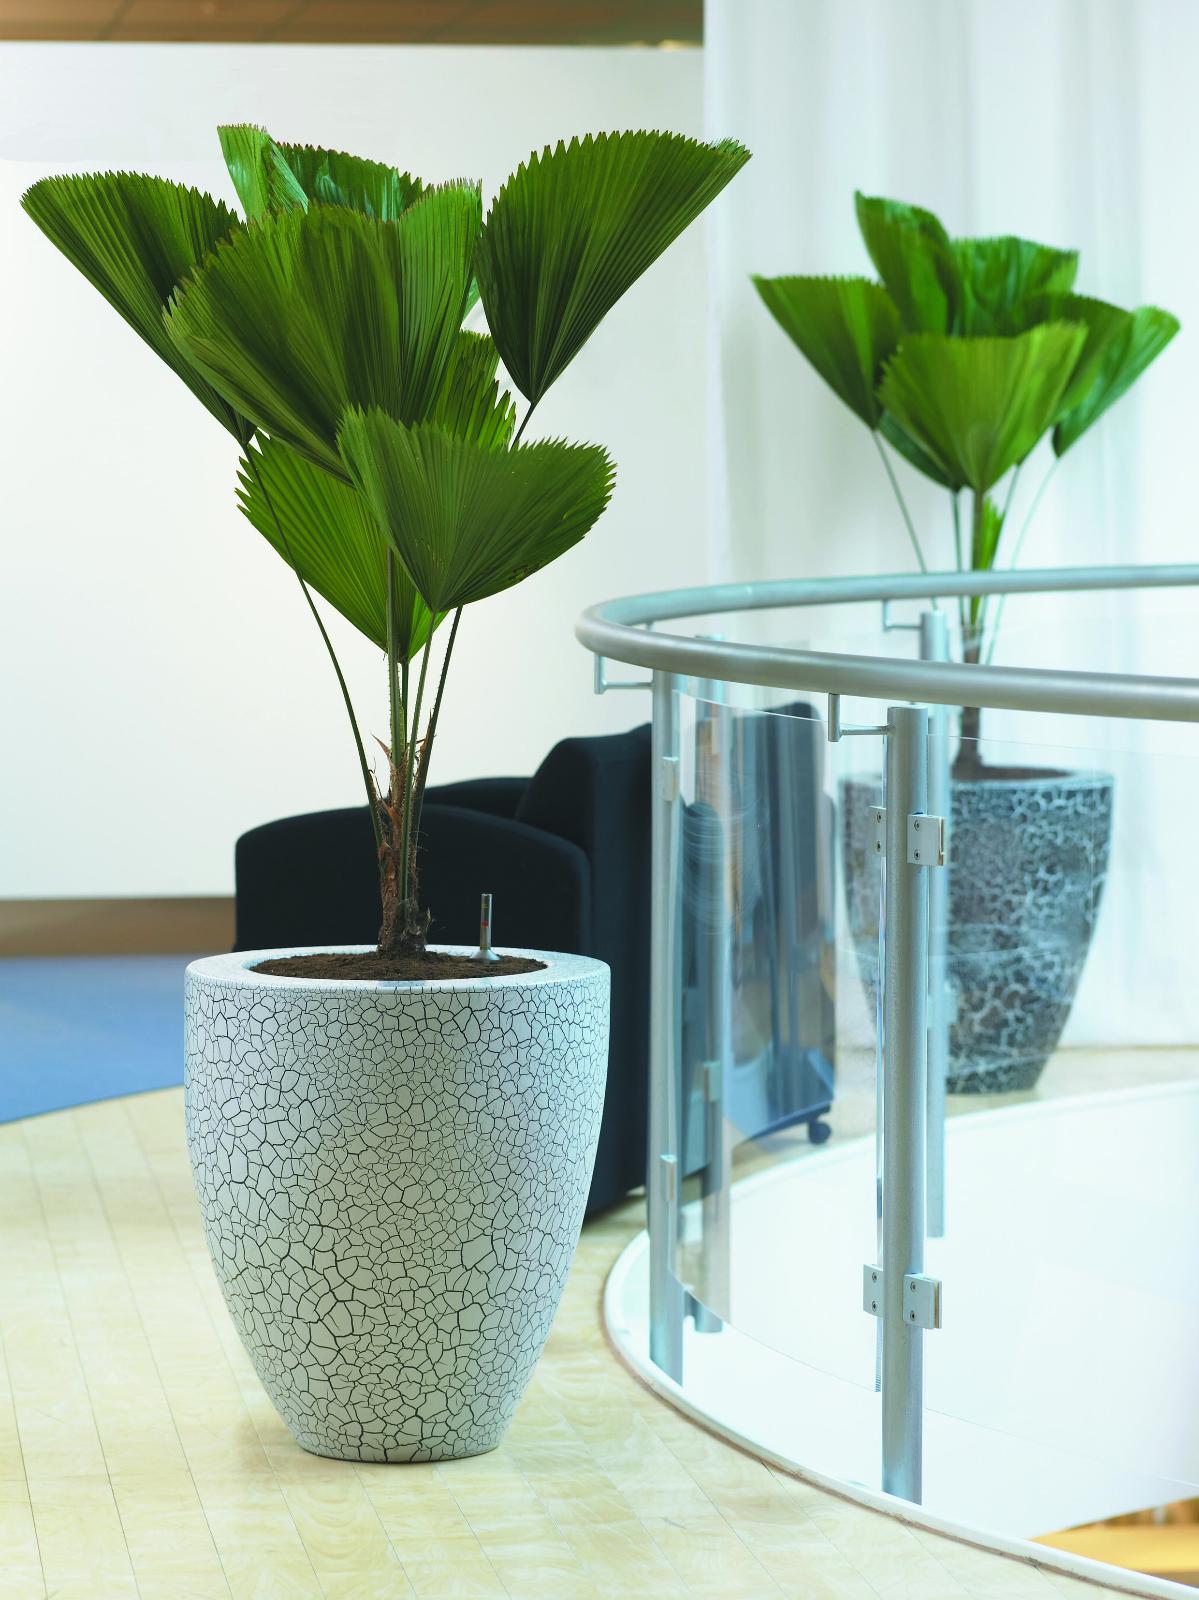 Licuala grandis (Ruffled Fan Palm Tree) 5 Seeds | RARE Indoor House Plant | UK